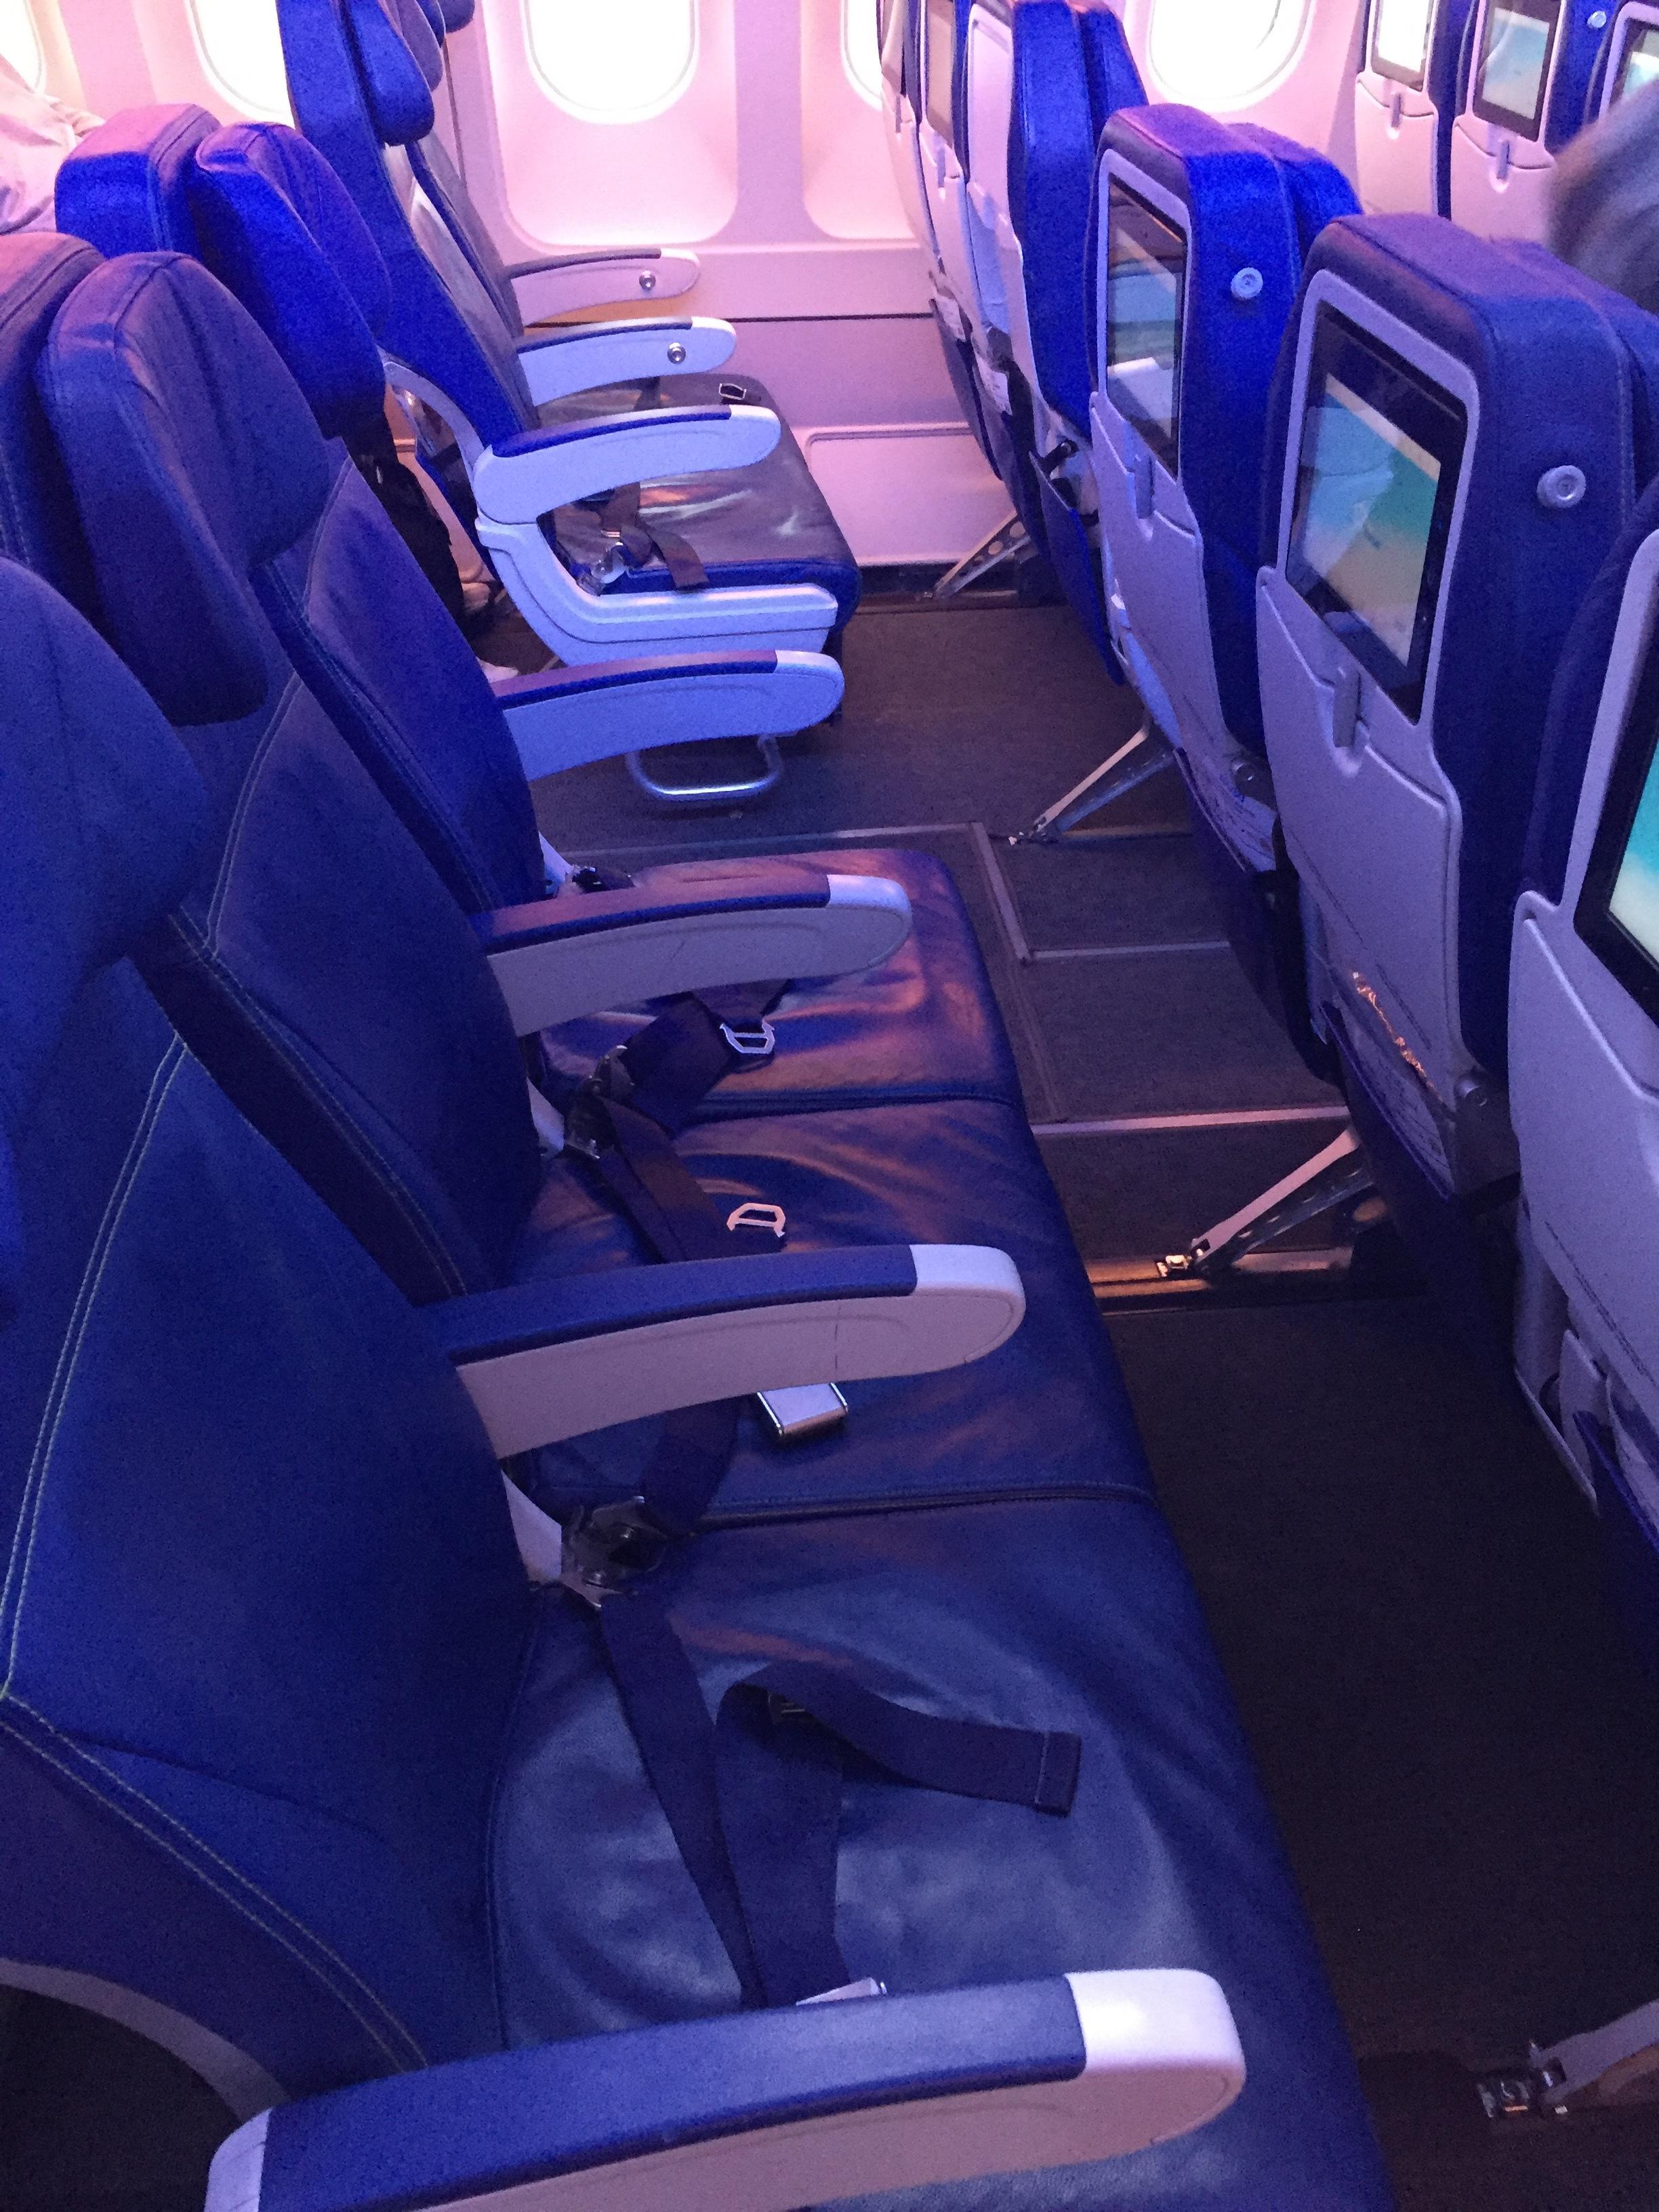 a330 economy seat air transat.JPG